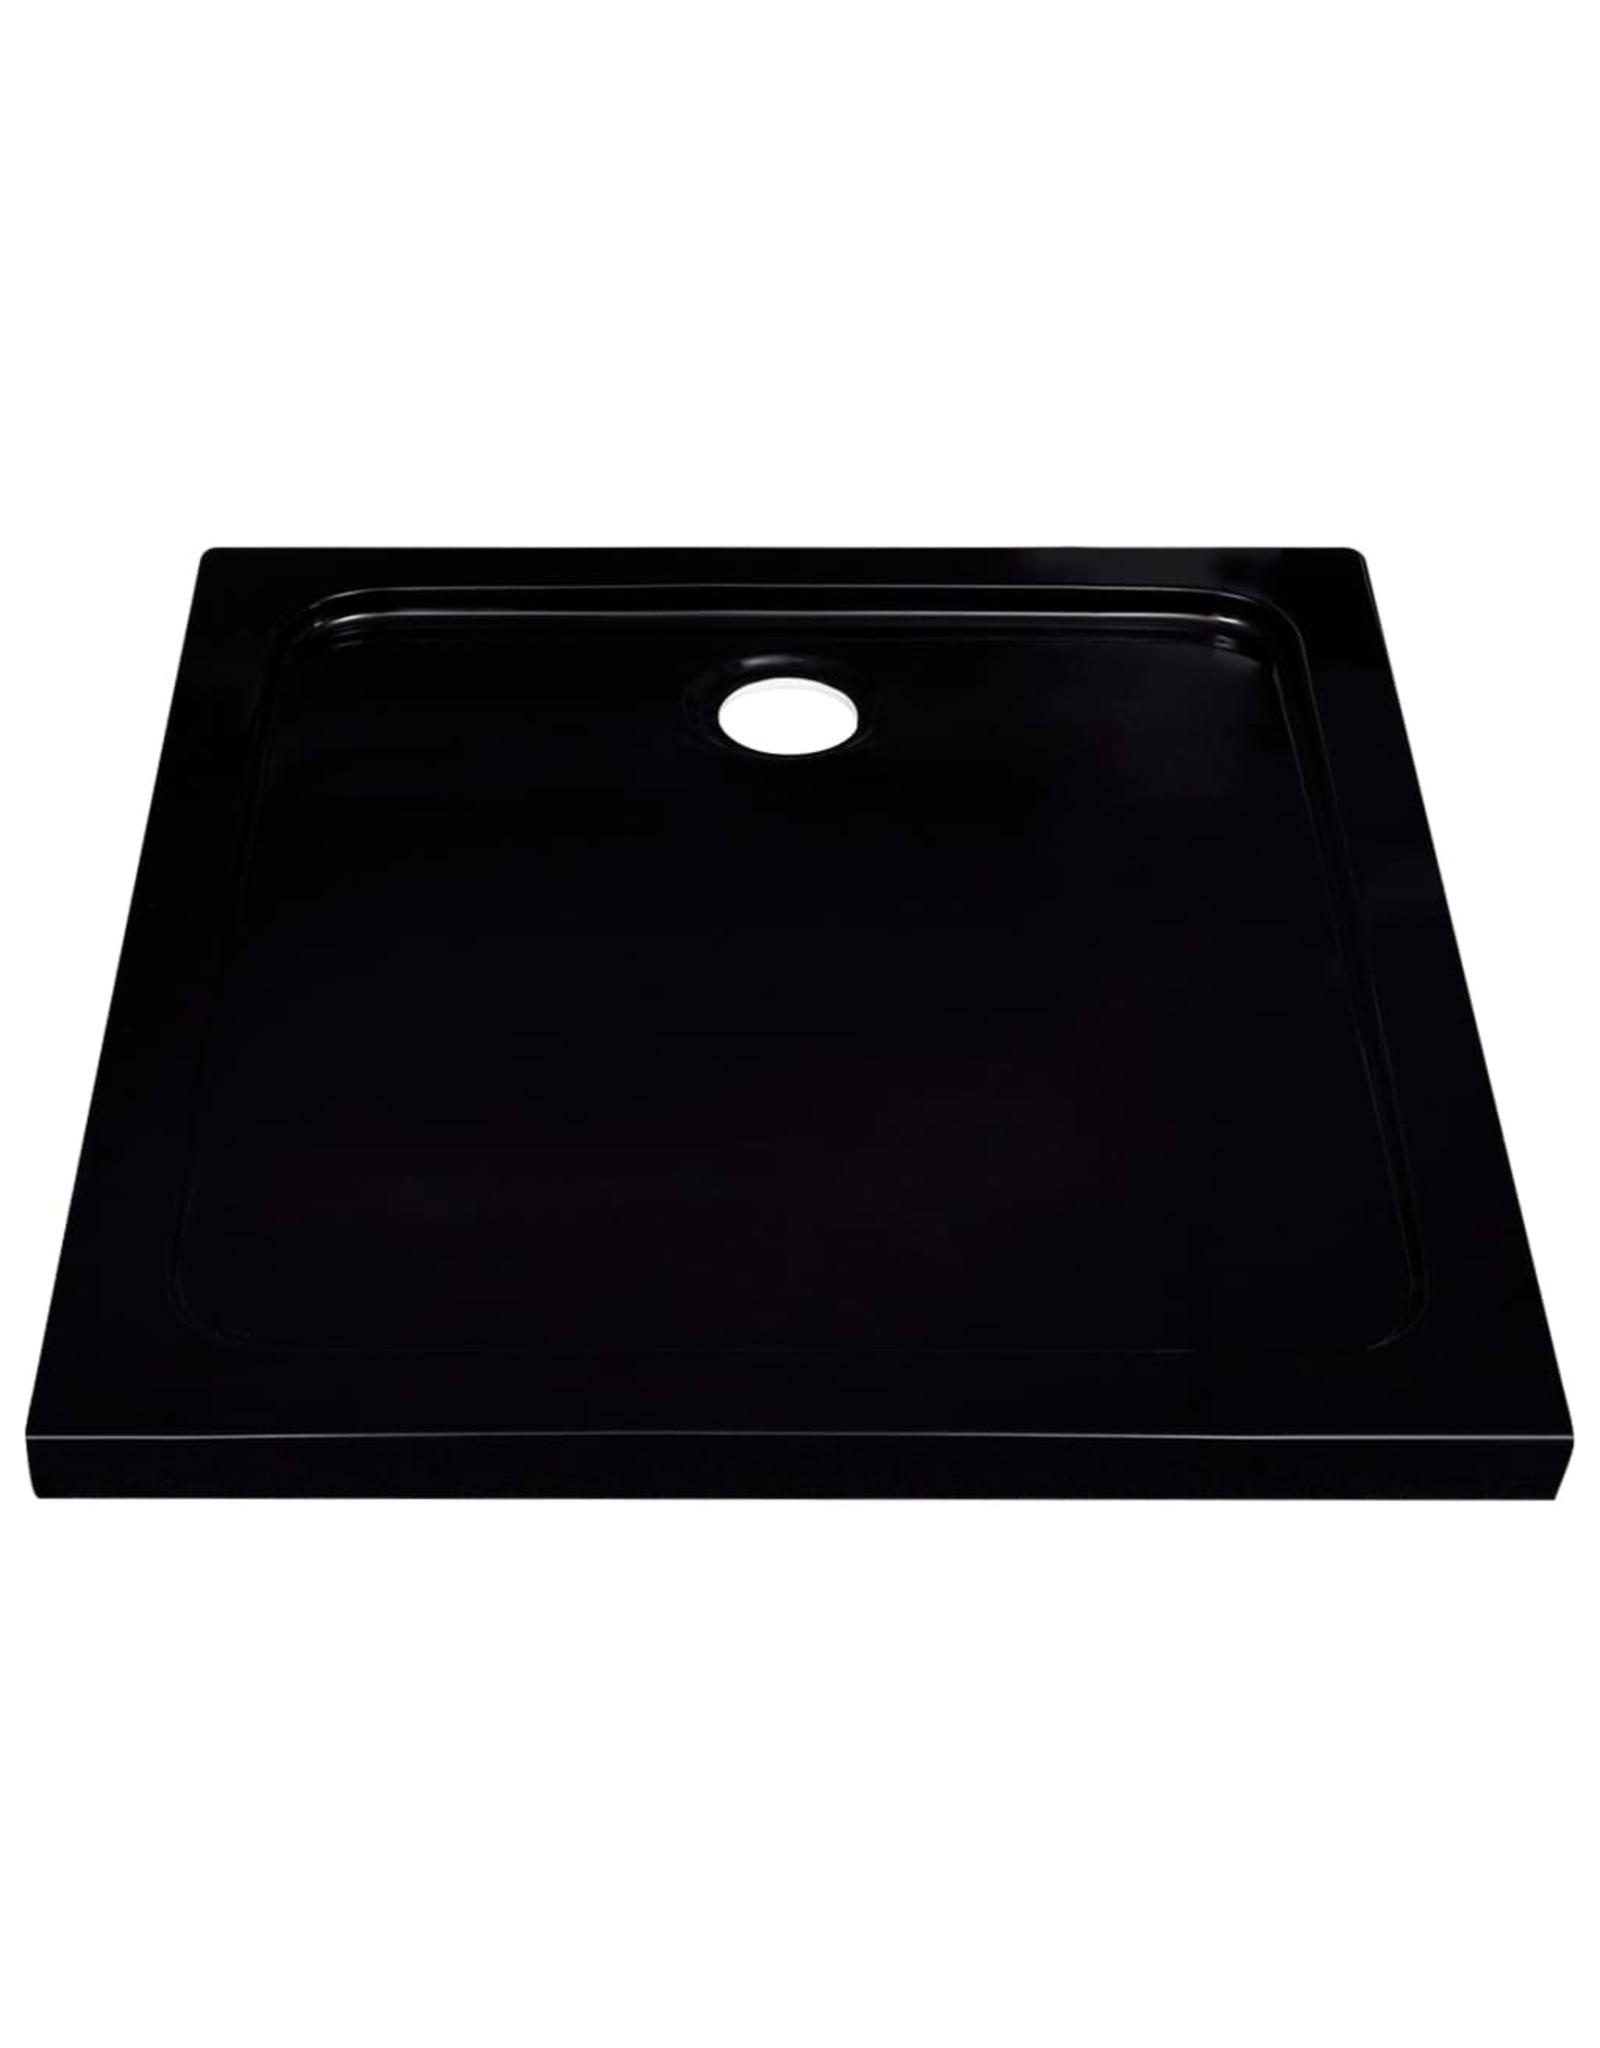 Douchebak 80x80 cm ABS zwart